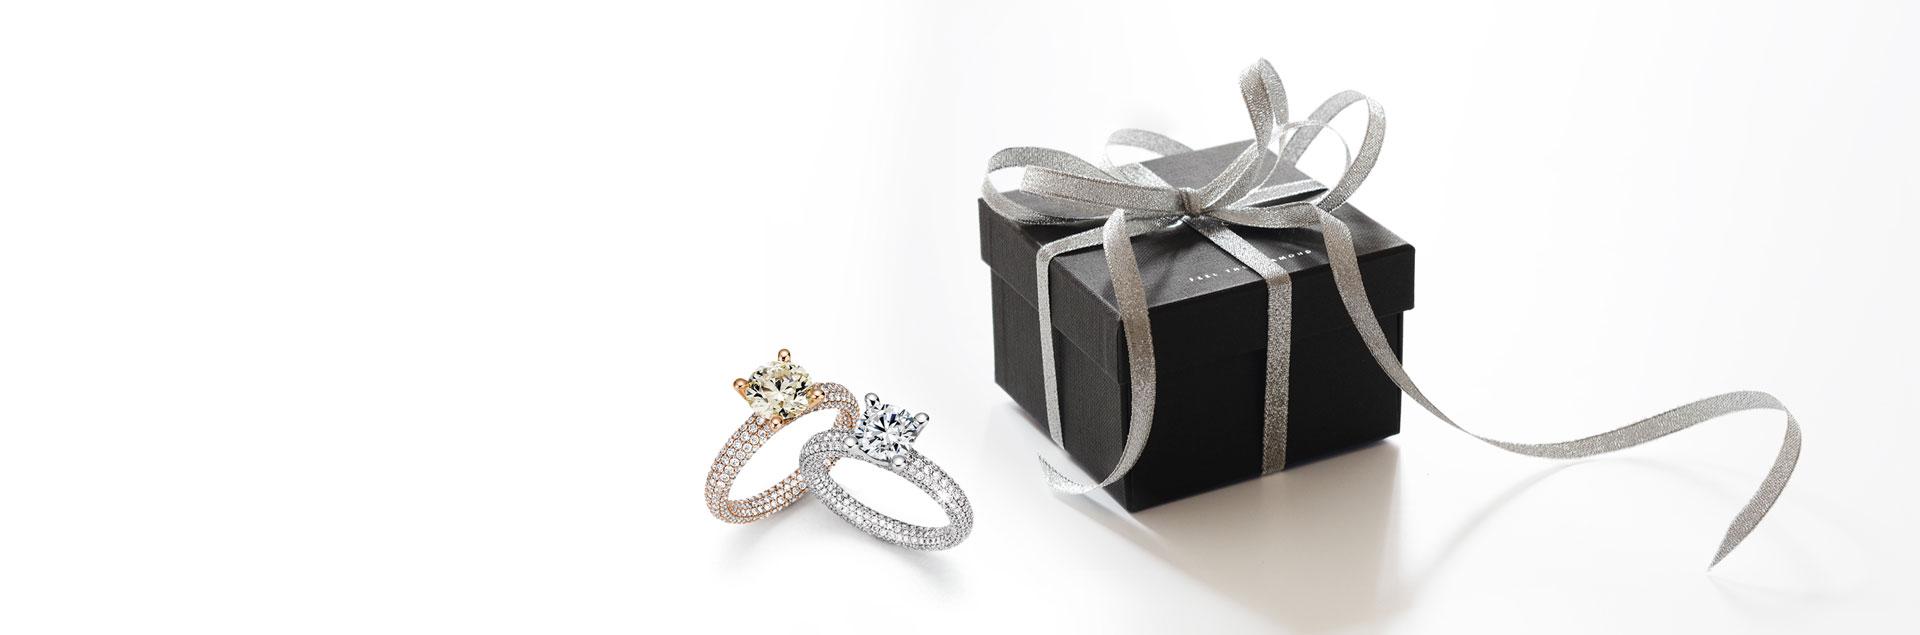 181129_noor-by-wurster-diamonds_Eternity-Ringe